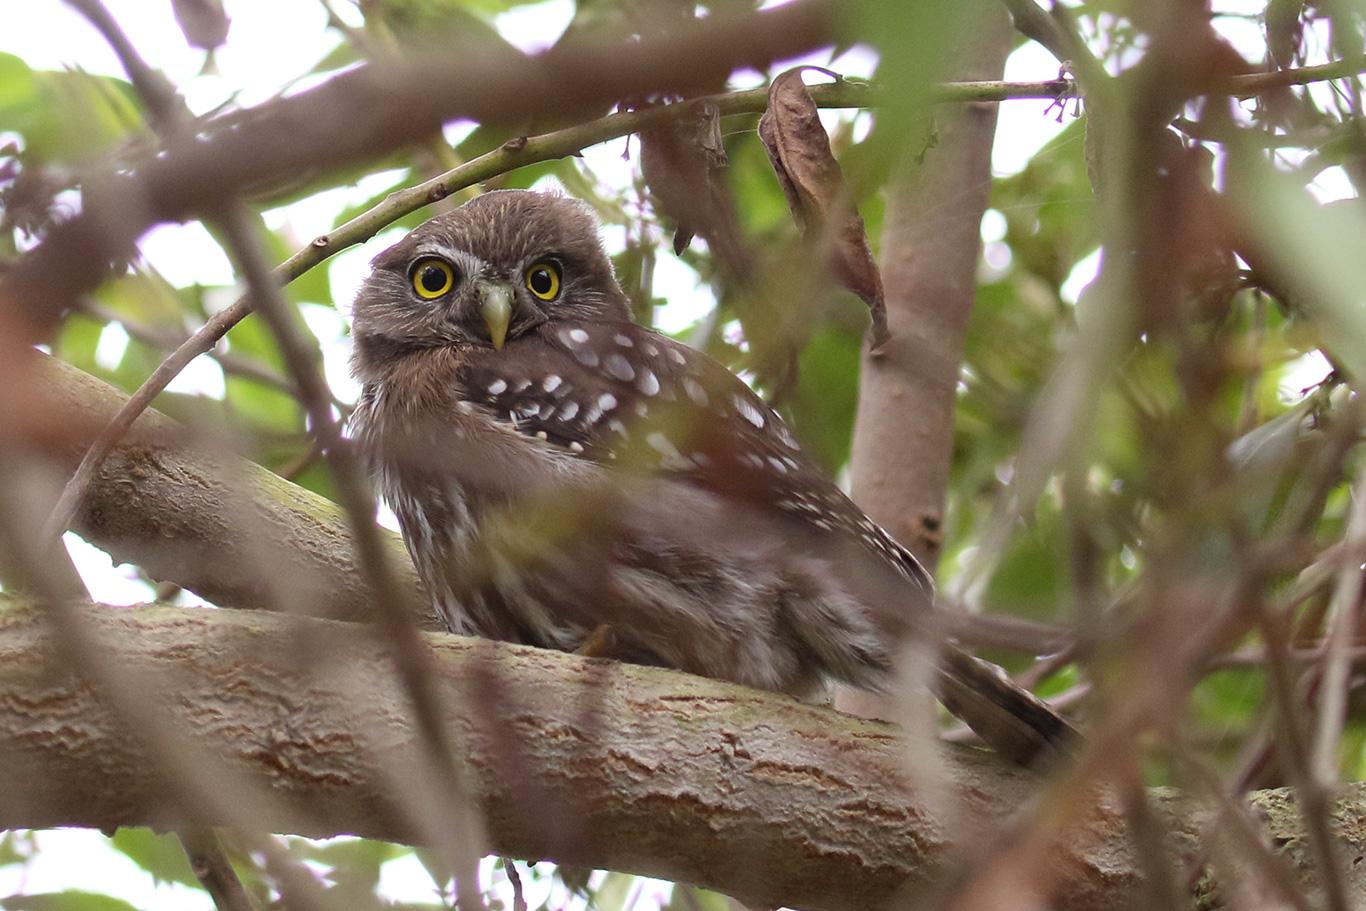 Austral Pygmy Owl, Parque Humedal Río Maípo, Chile.